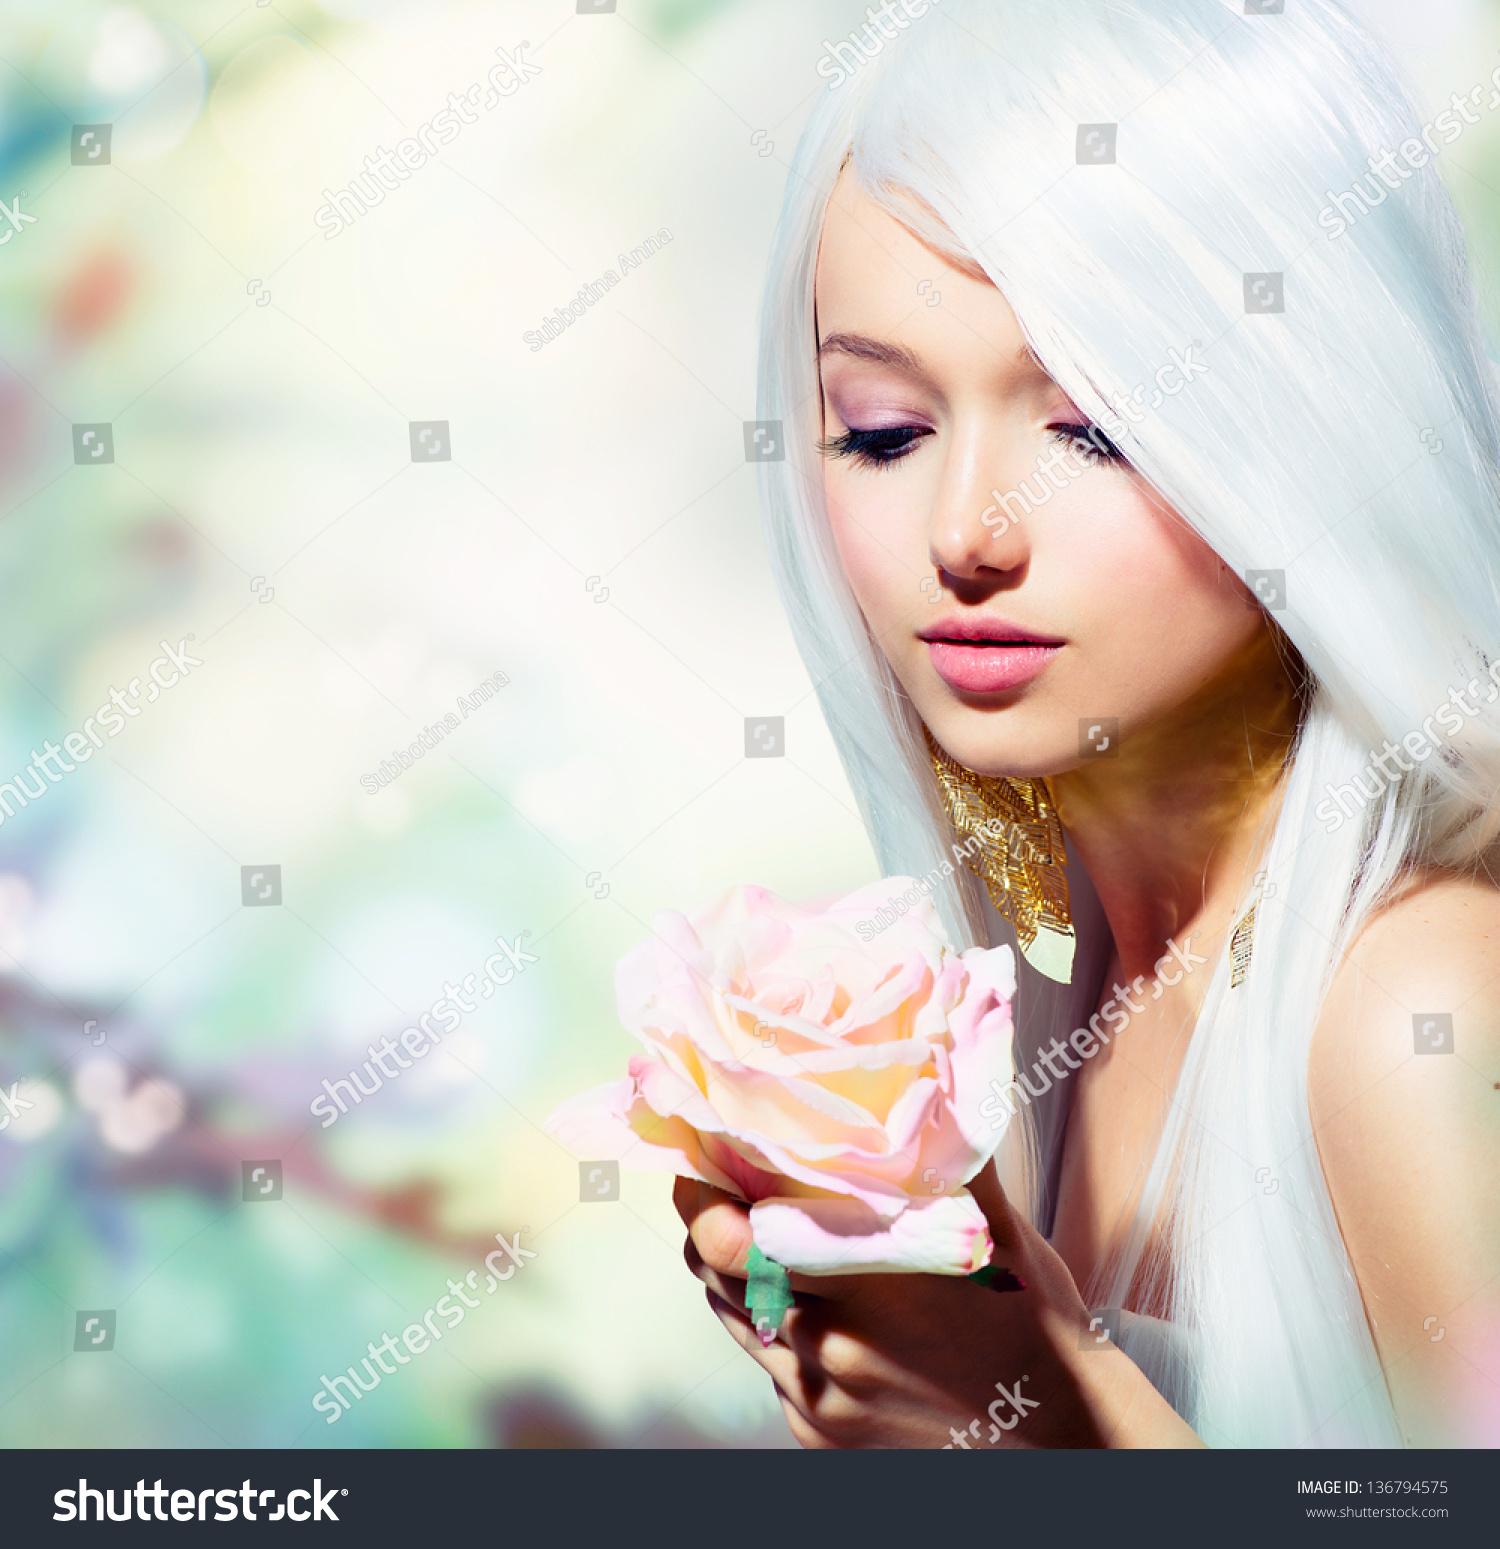 Free Download Wallpaper Anime Girl Beautiful Spring Girl Rose Flower Fantasy Stock Photo